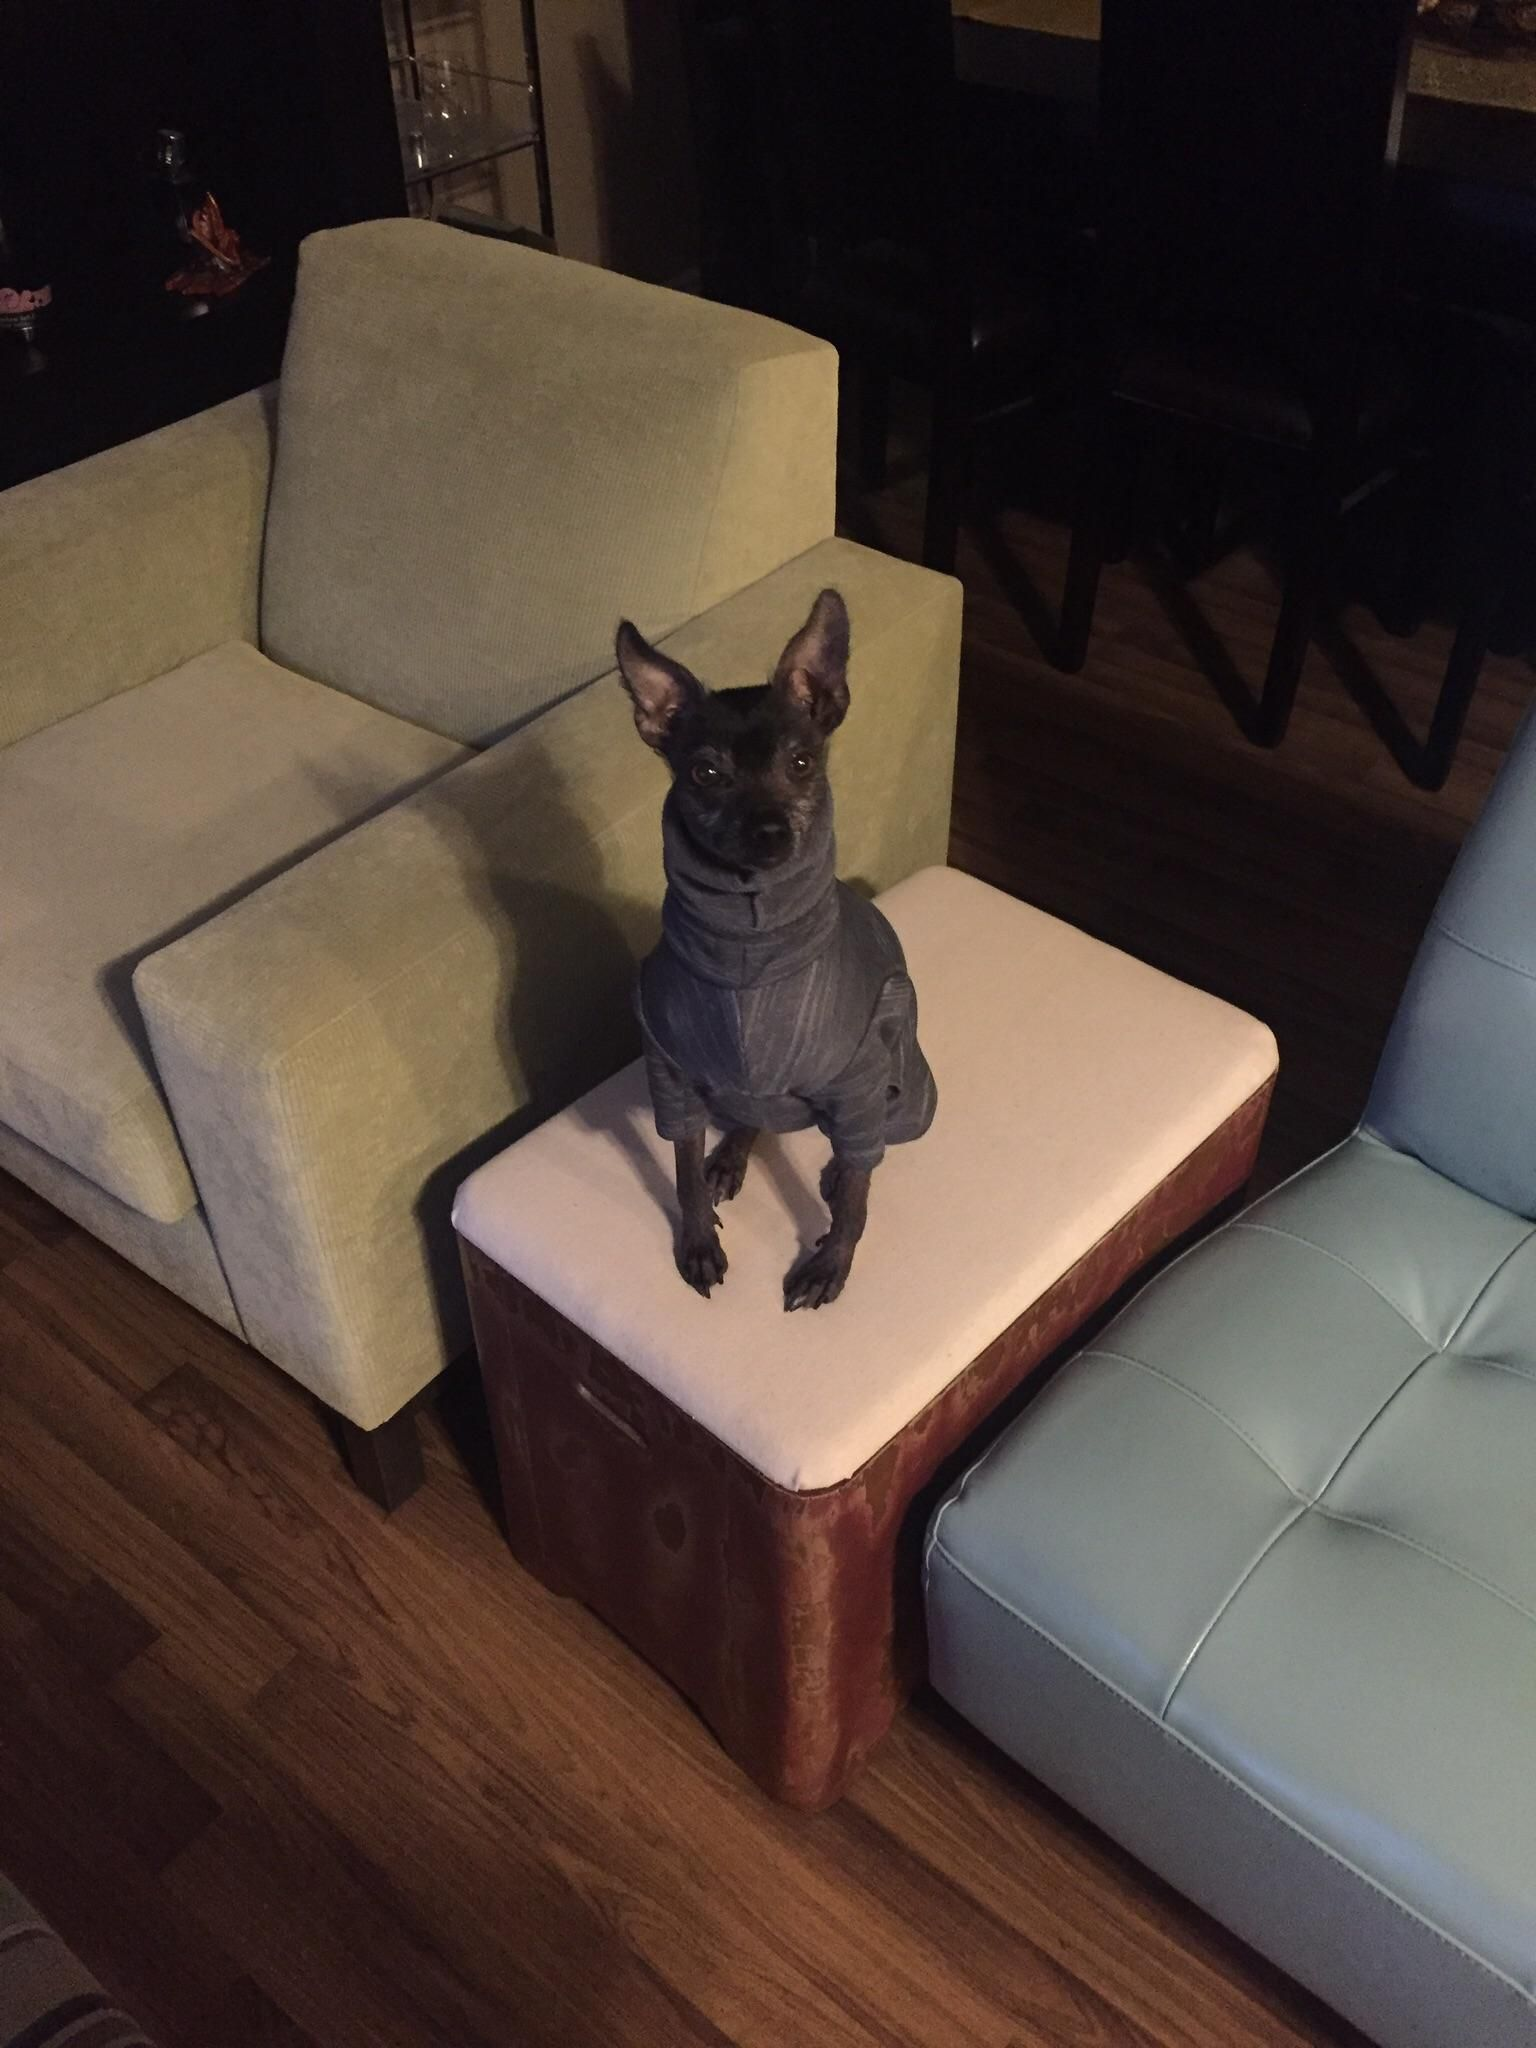 PsBattle: Xolo on bench